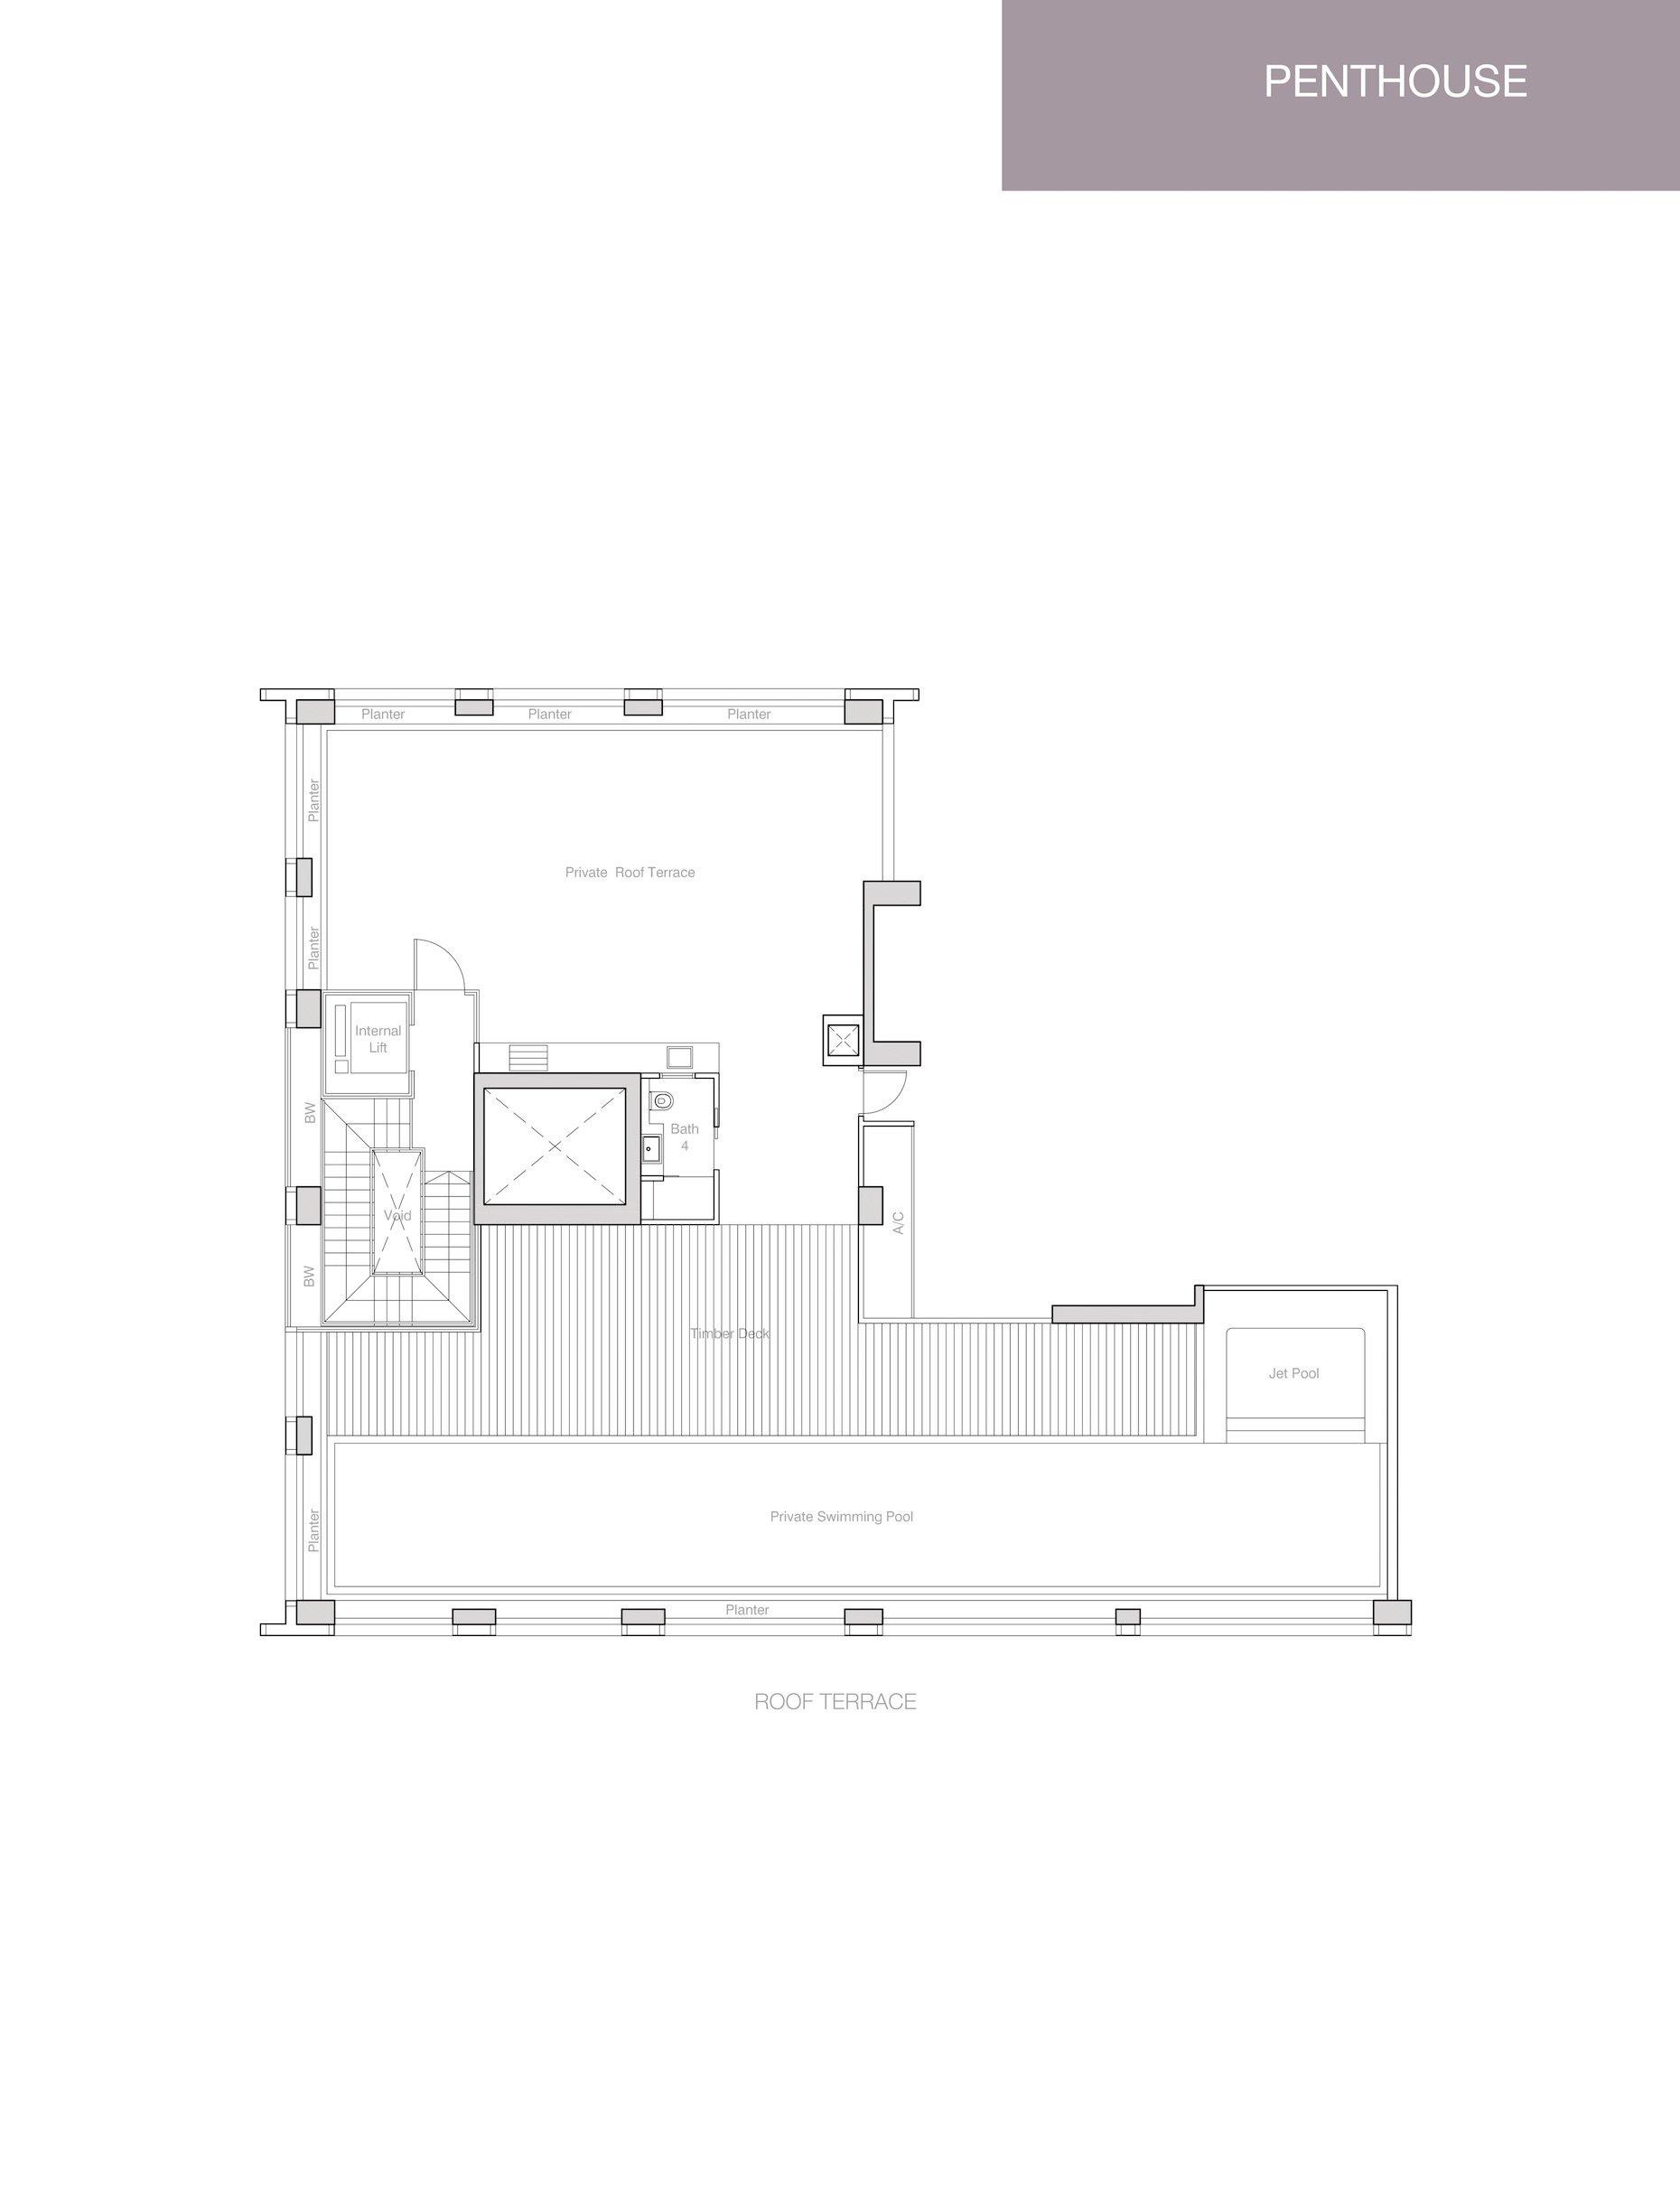 Nouvel 18 明筑公寓 floor plans PH3 36-06 upper